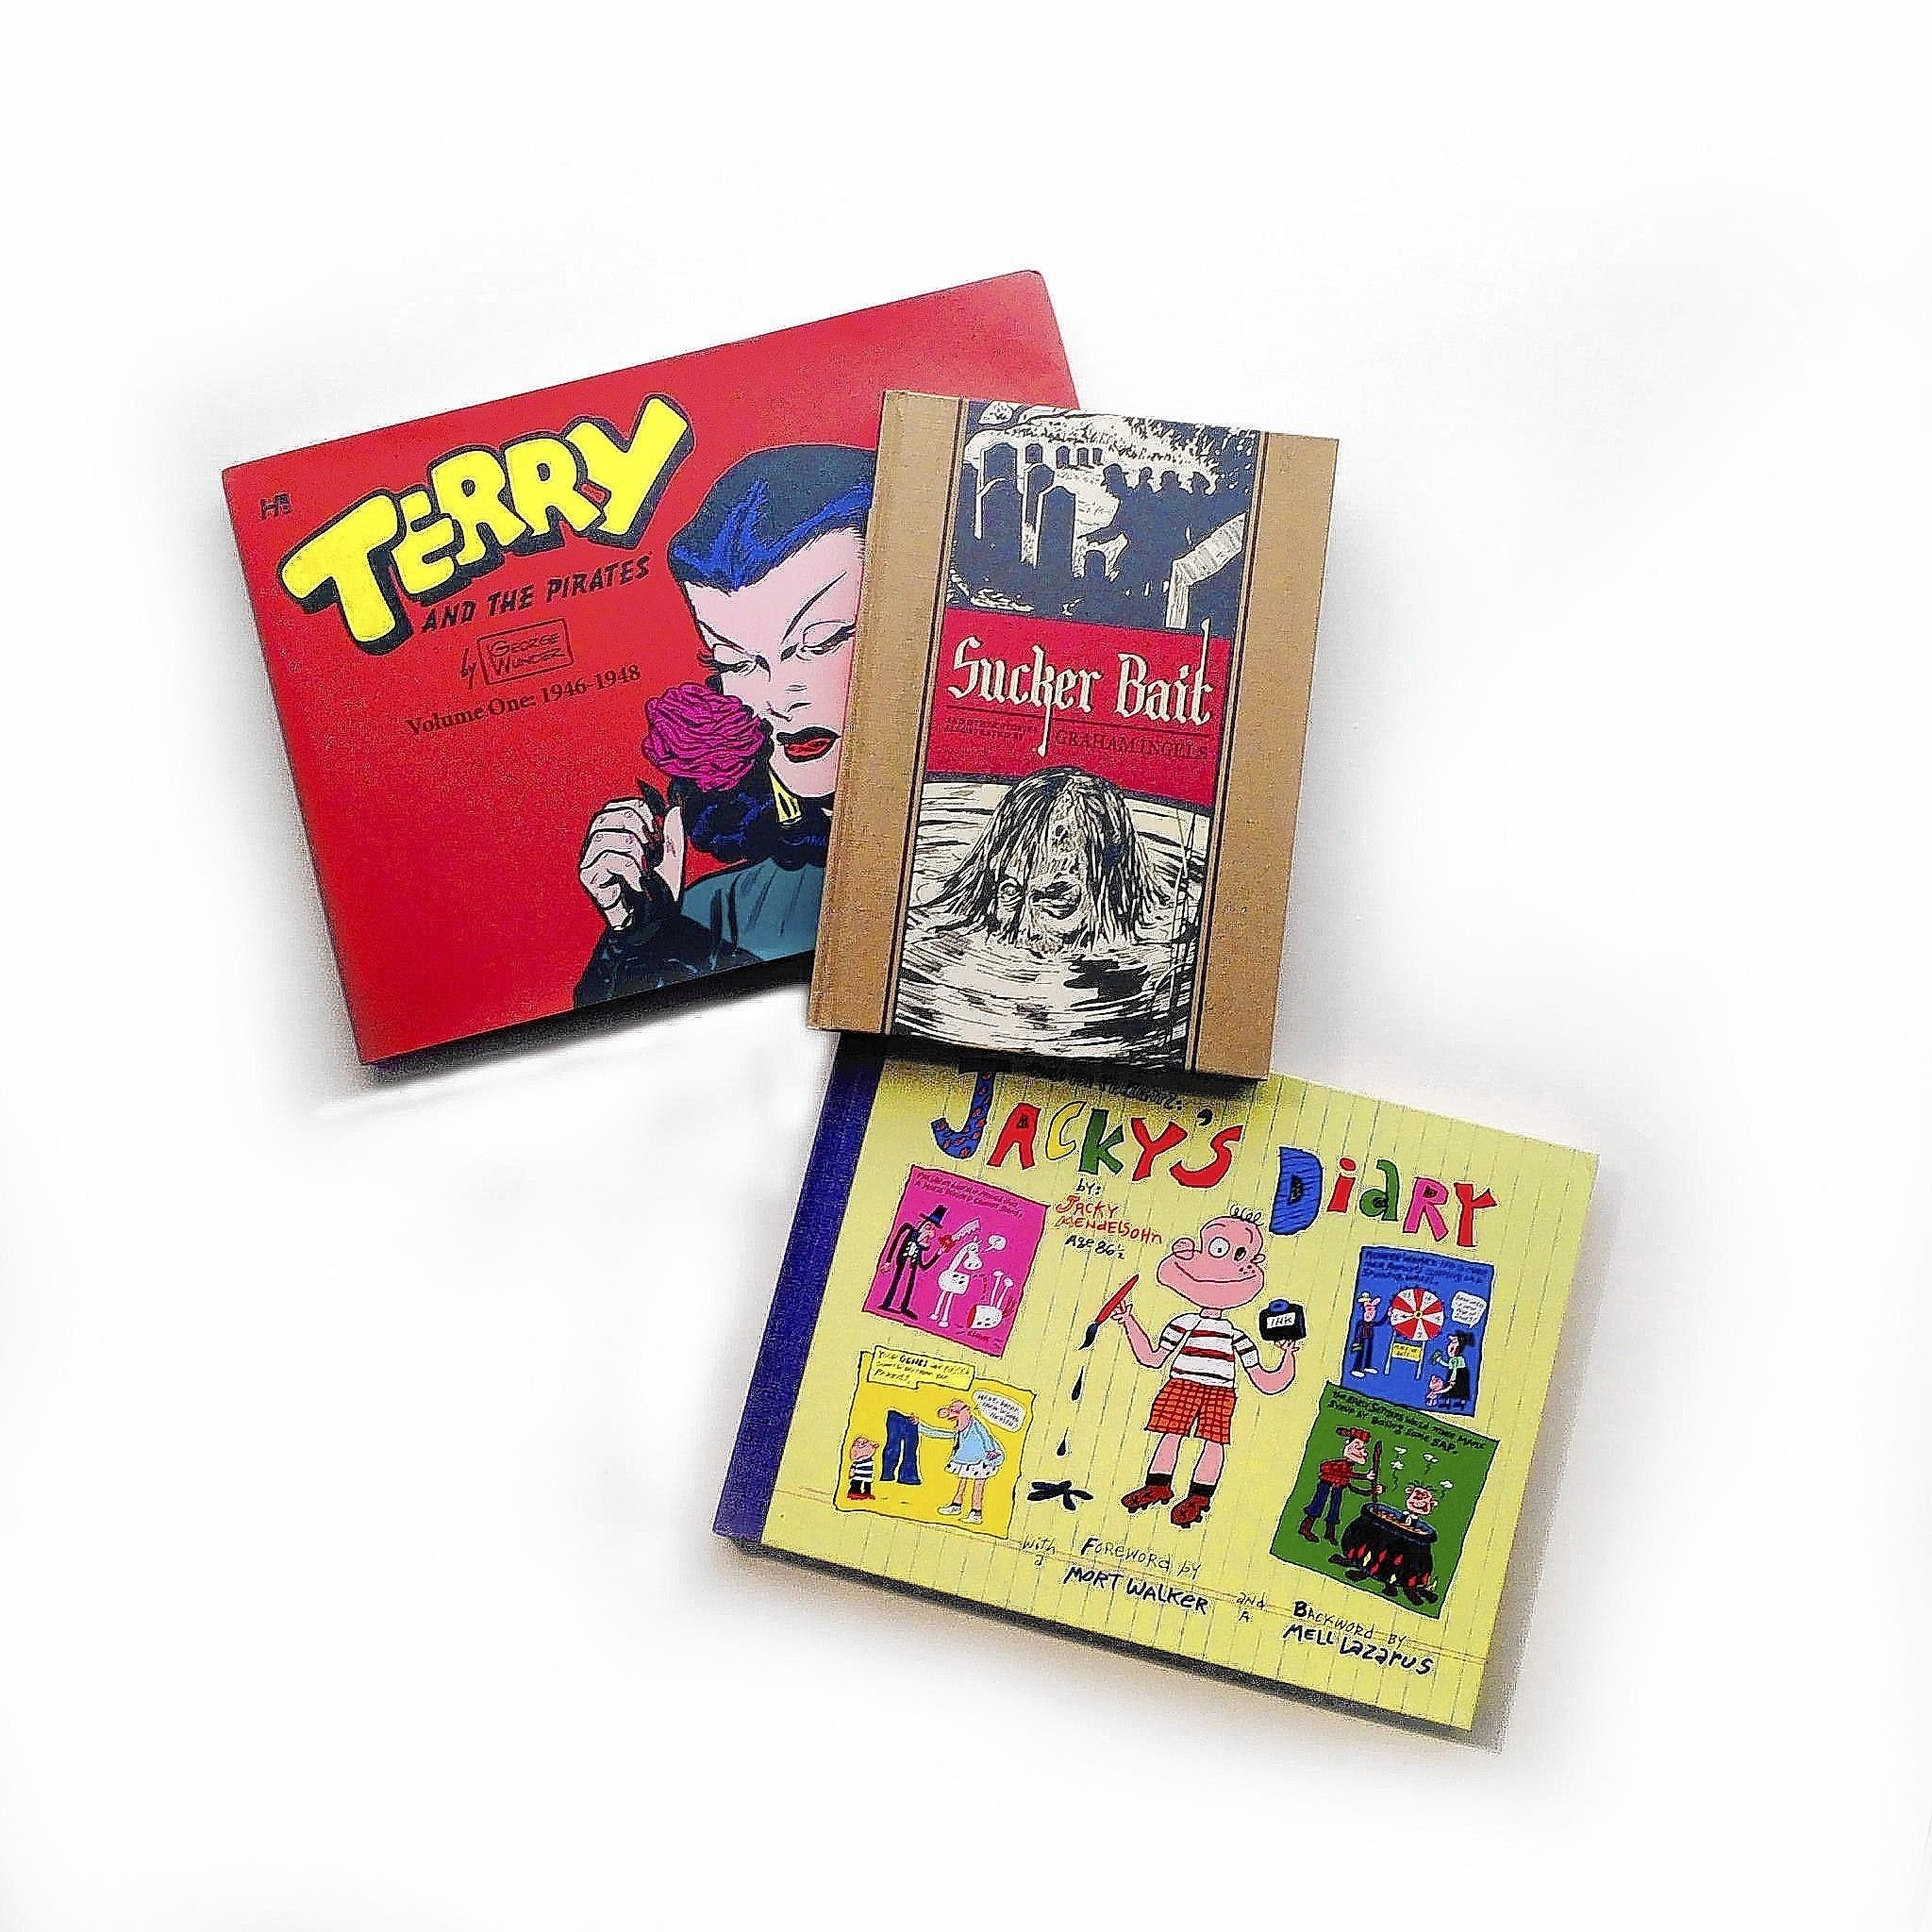 Comic Book Roundup Jackys Diary More Chicago Tribune